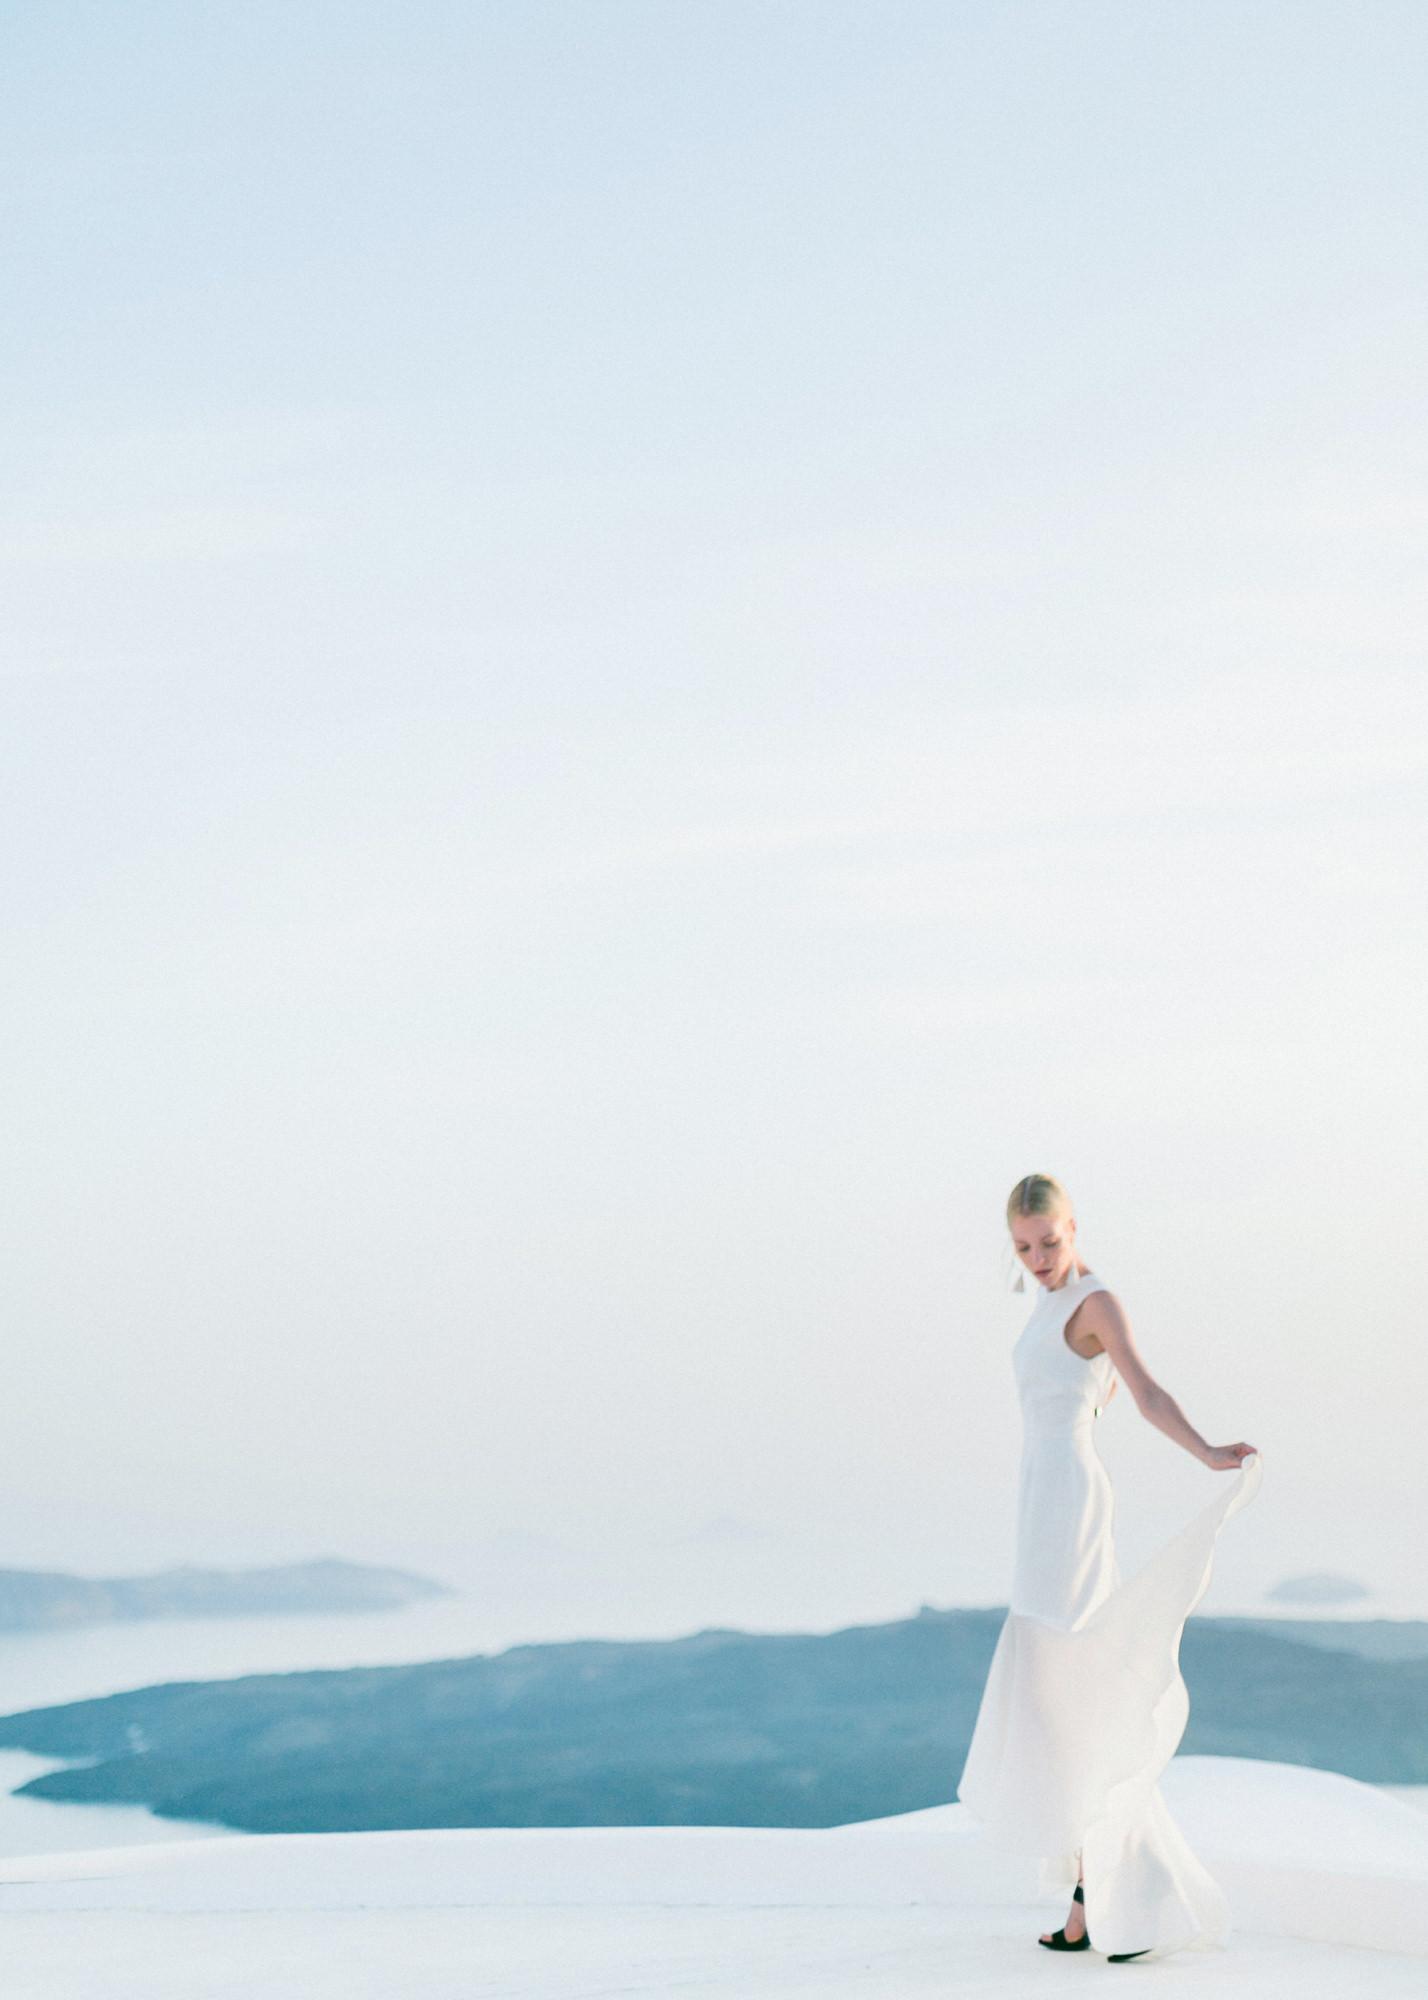 68-portrait-santorini-wedding-photographer-greece-b-v